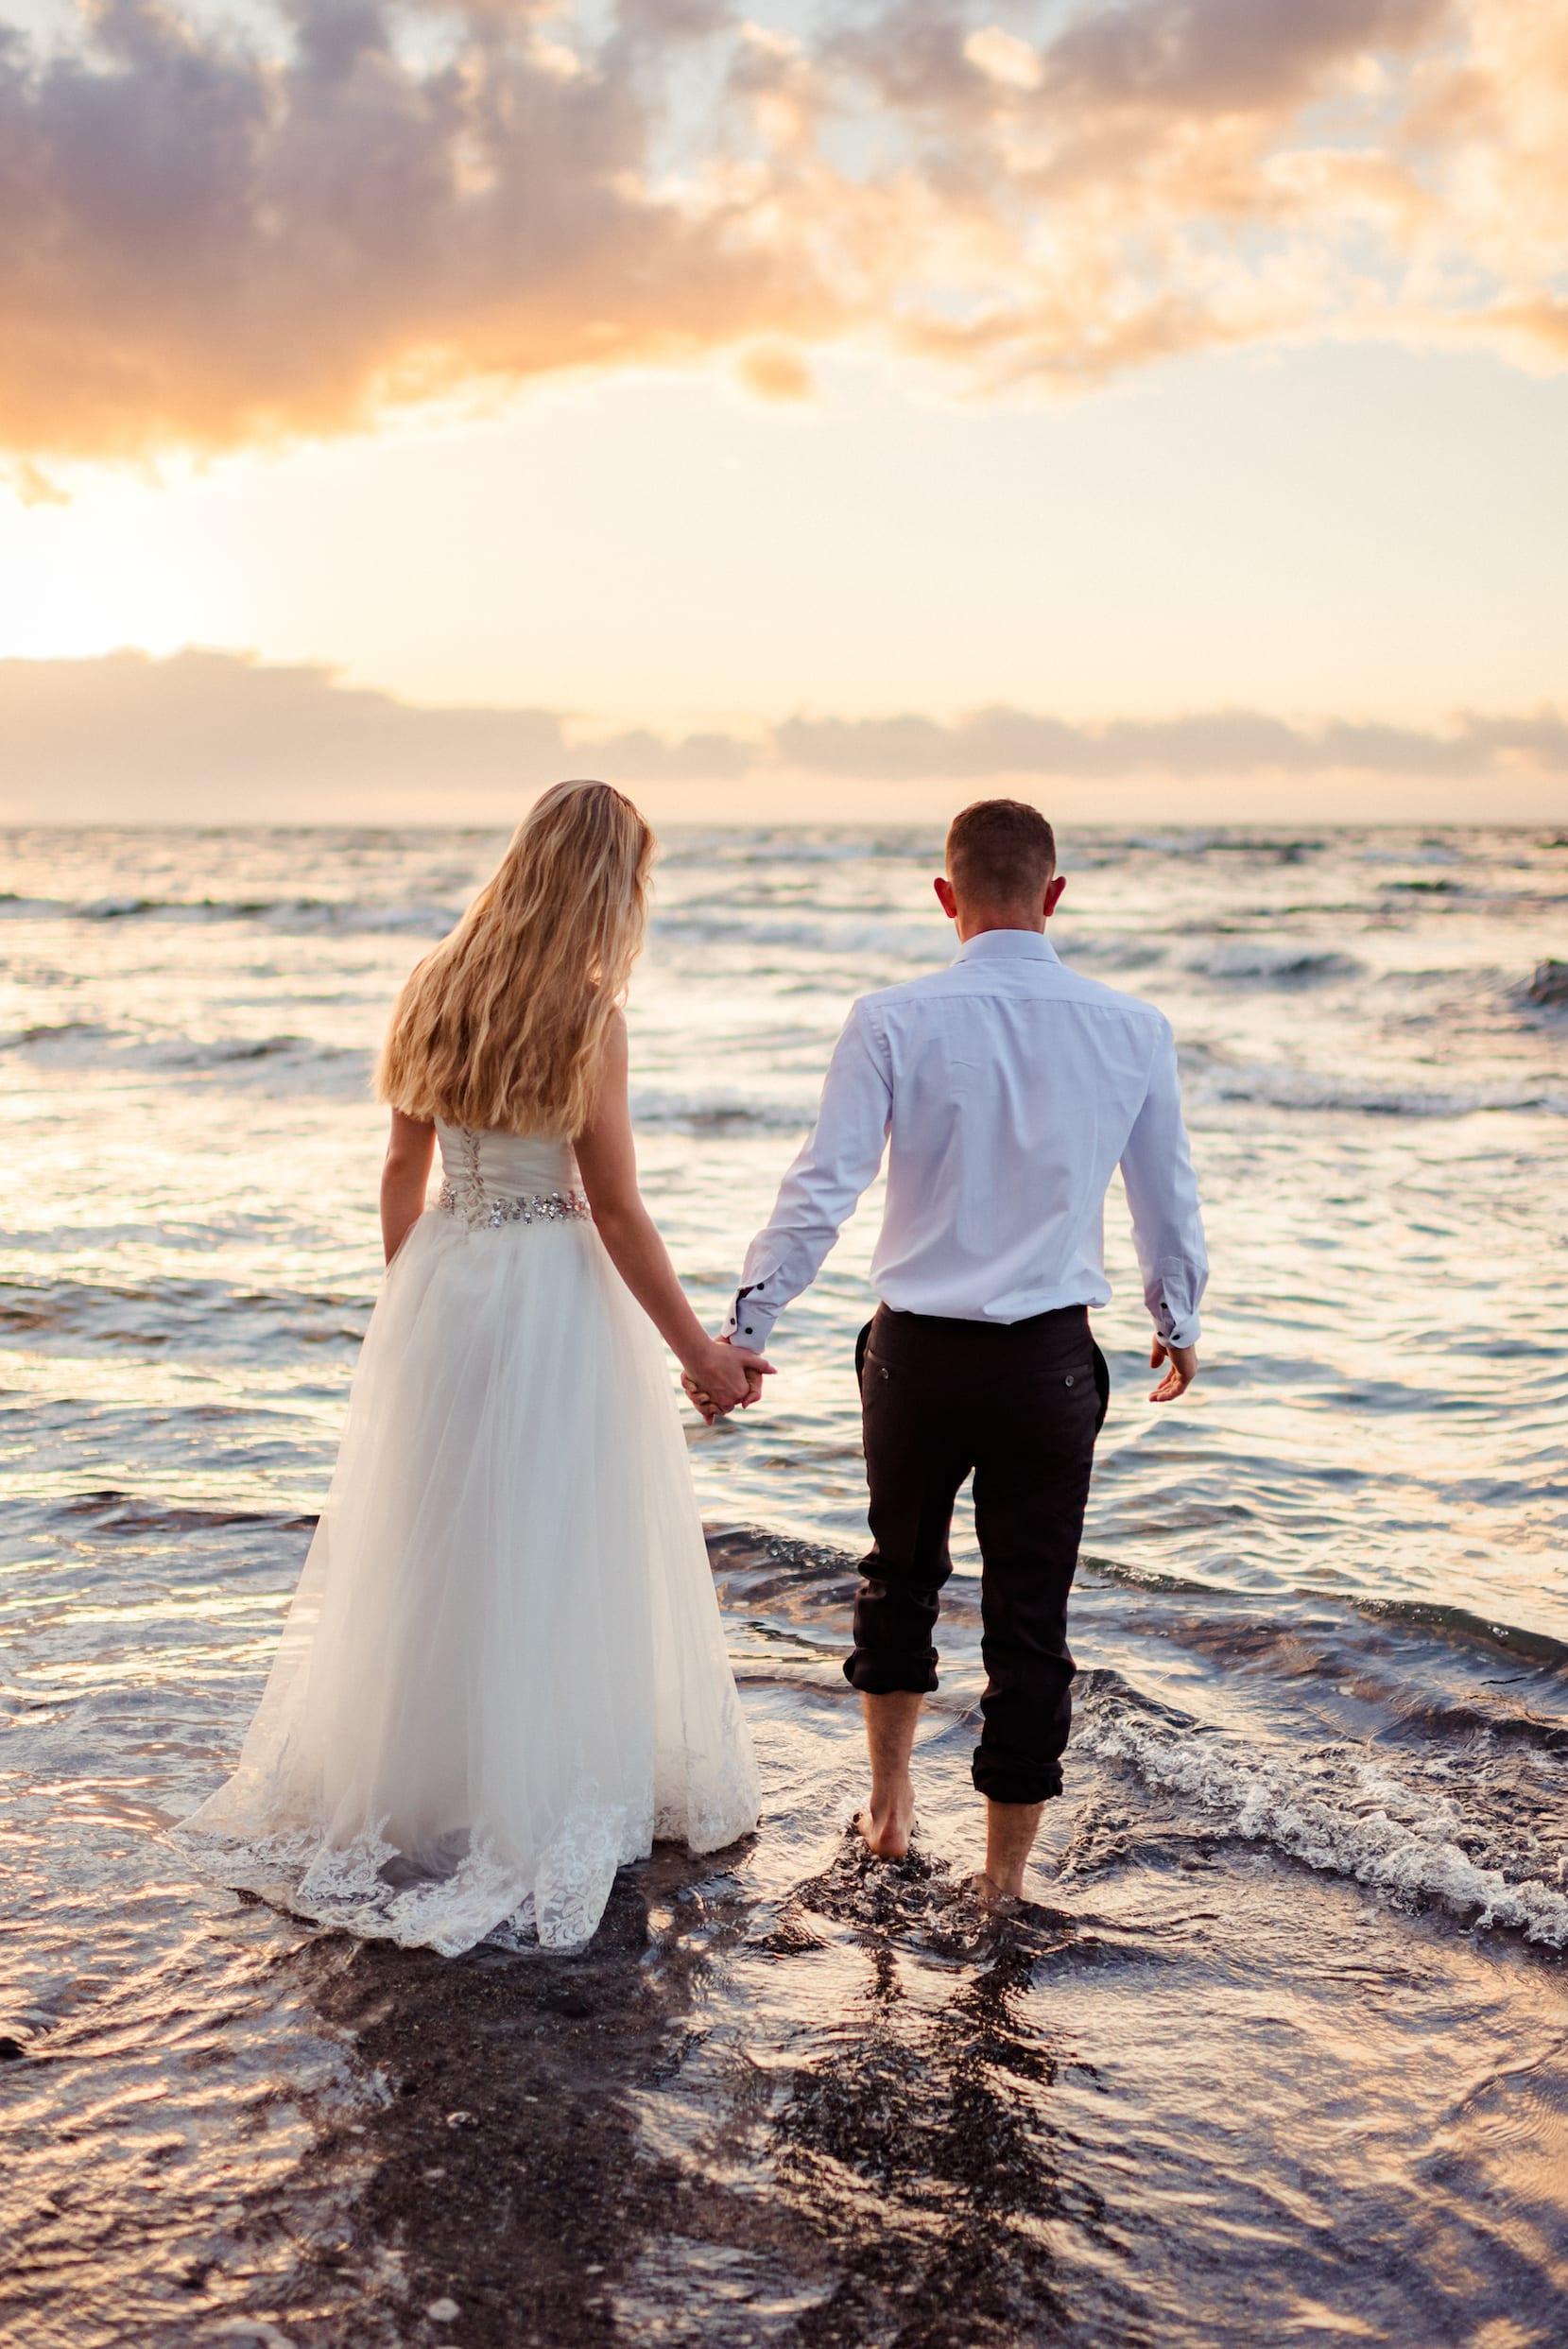 Big-Island-Elopement-Private-Wedding-Hawaii-Beach-12.jpg